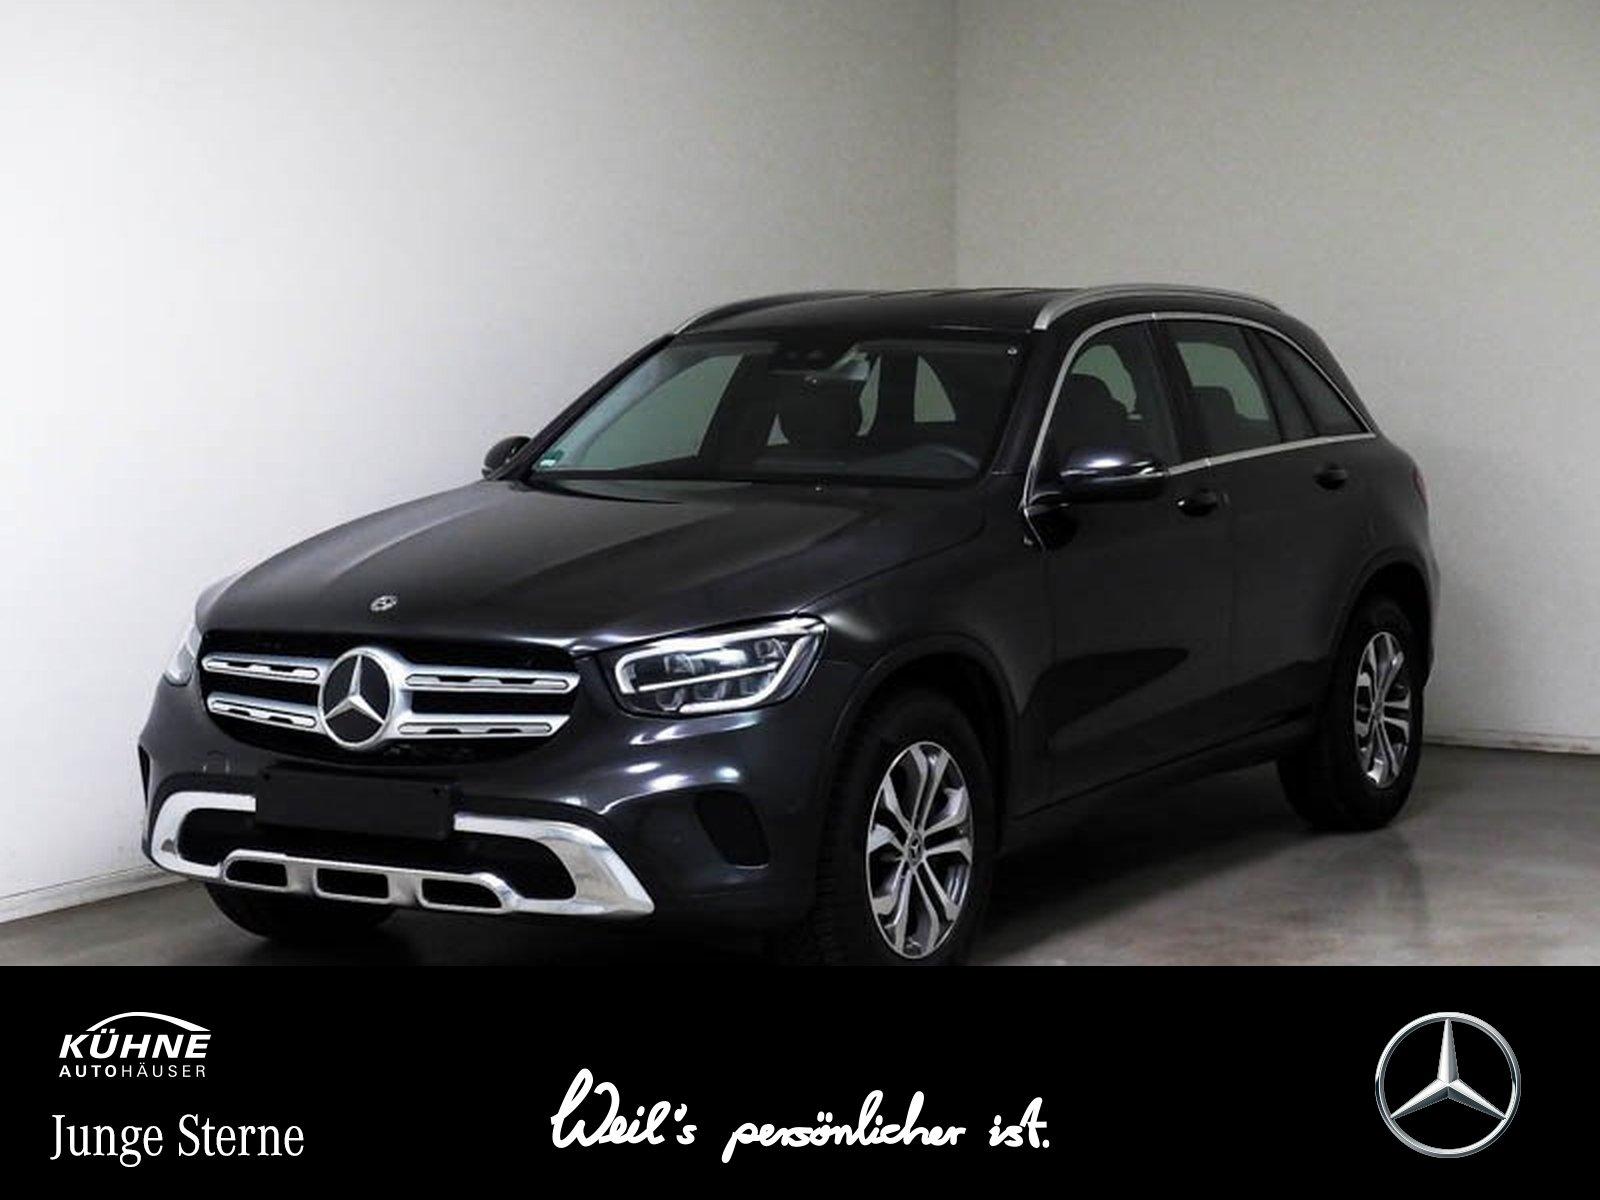 Mercedes-Benz GLC 200 d 4M Face+Business+Easy+Advanced+Kamera, Jahr 2019, Diesel